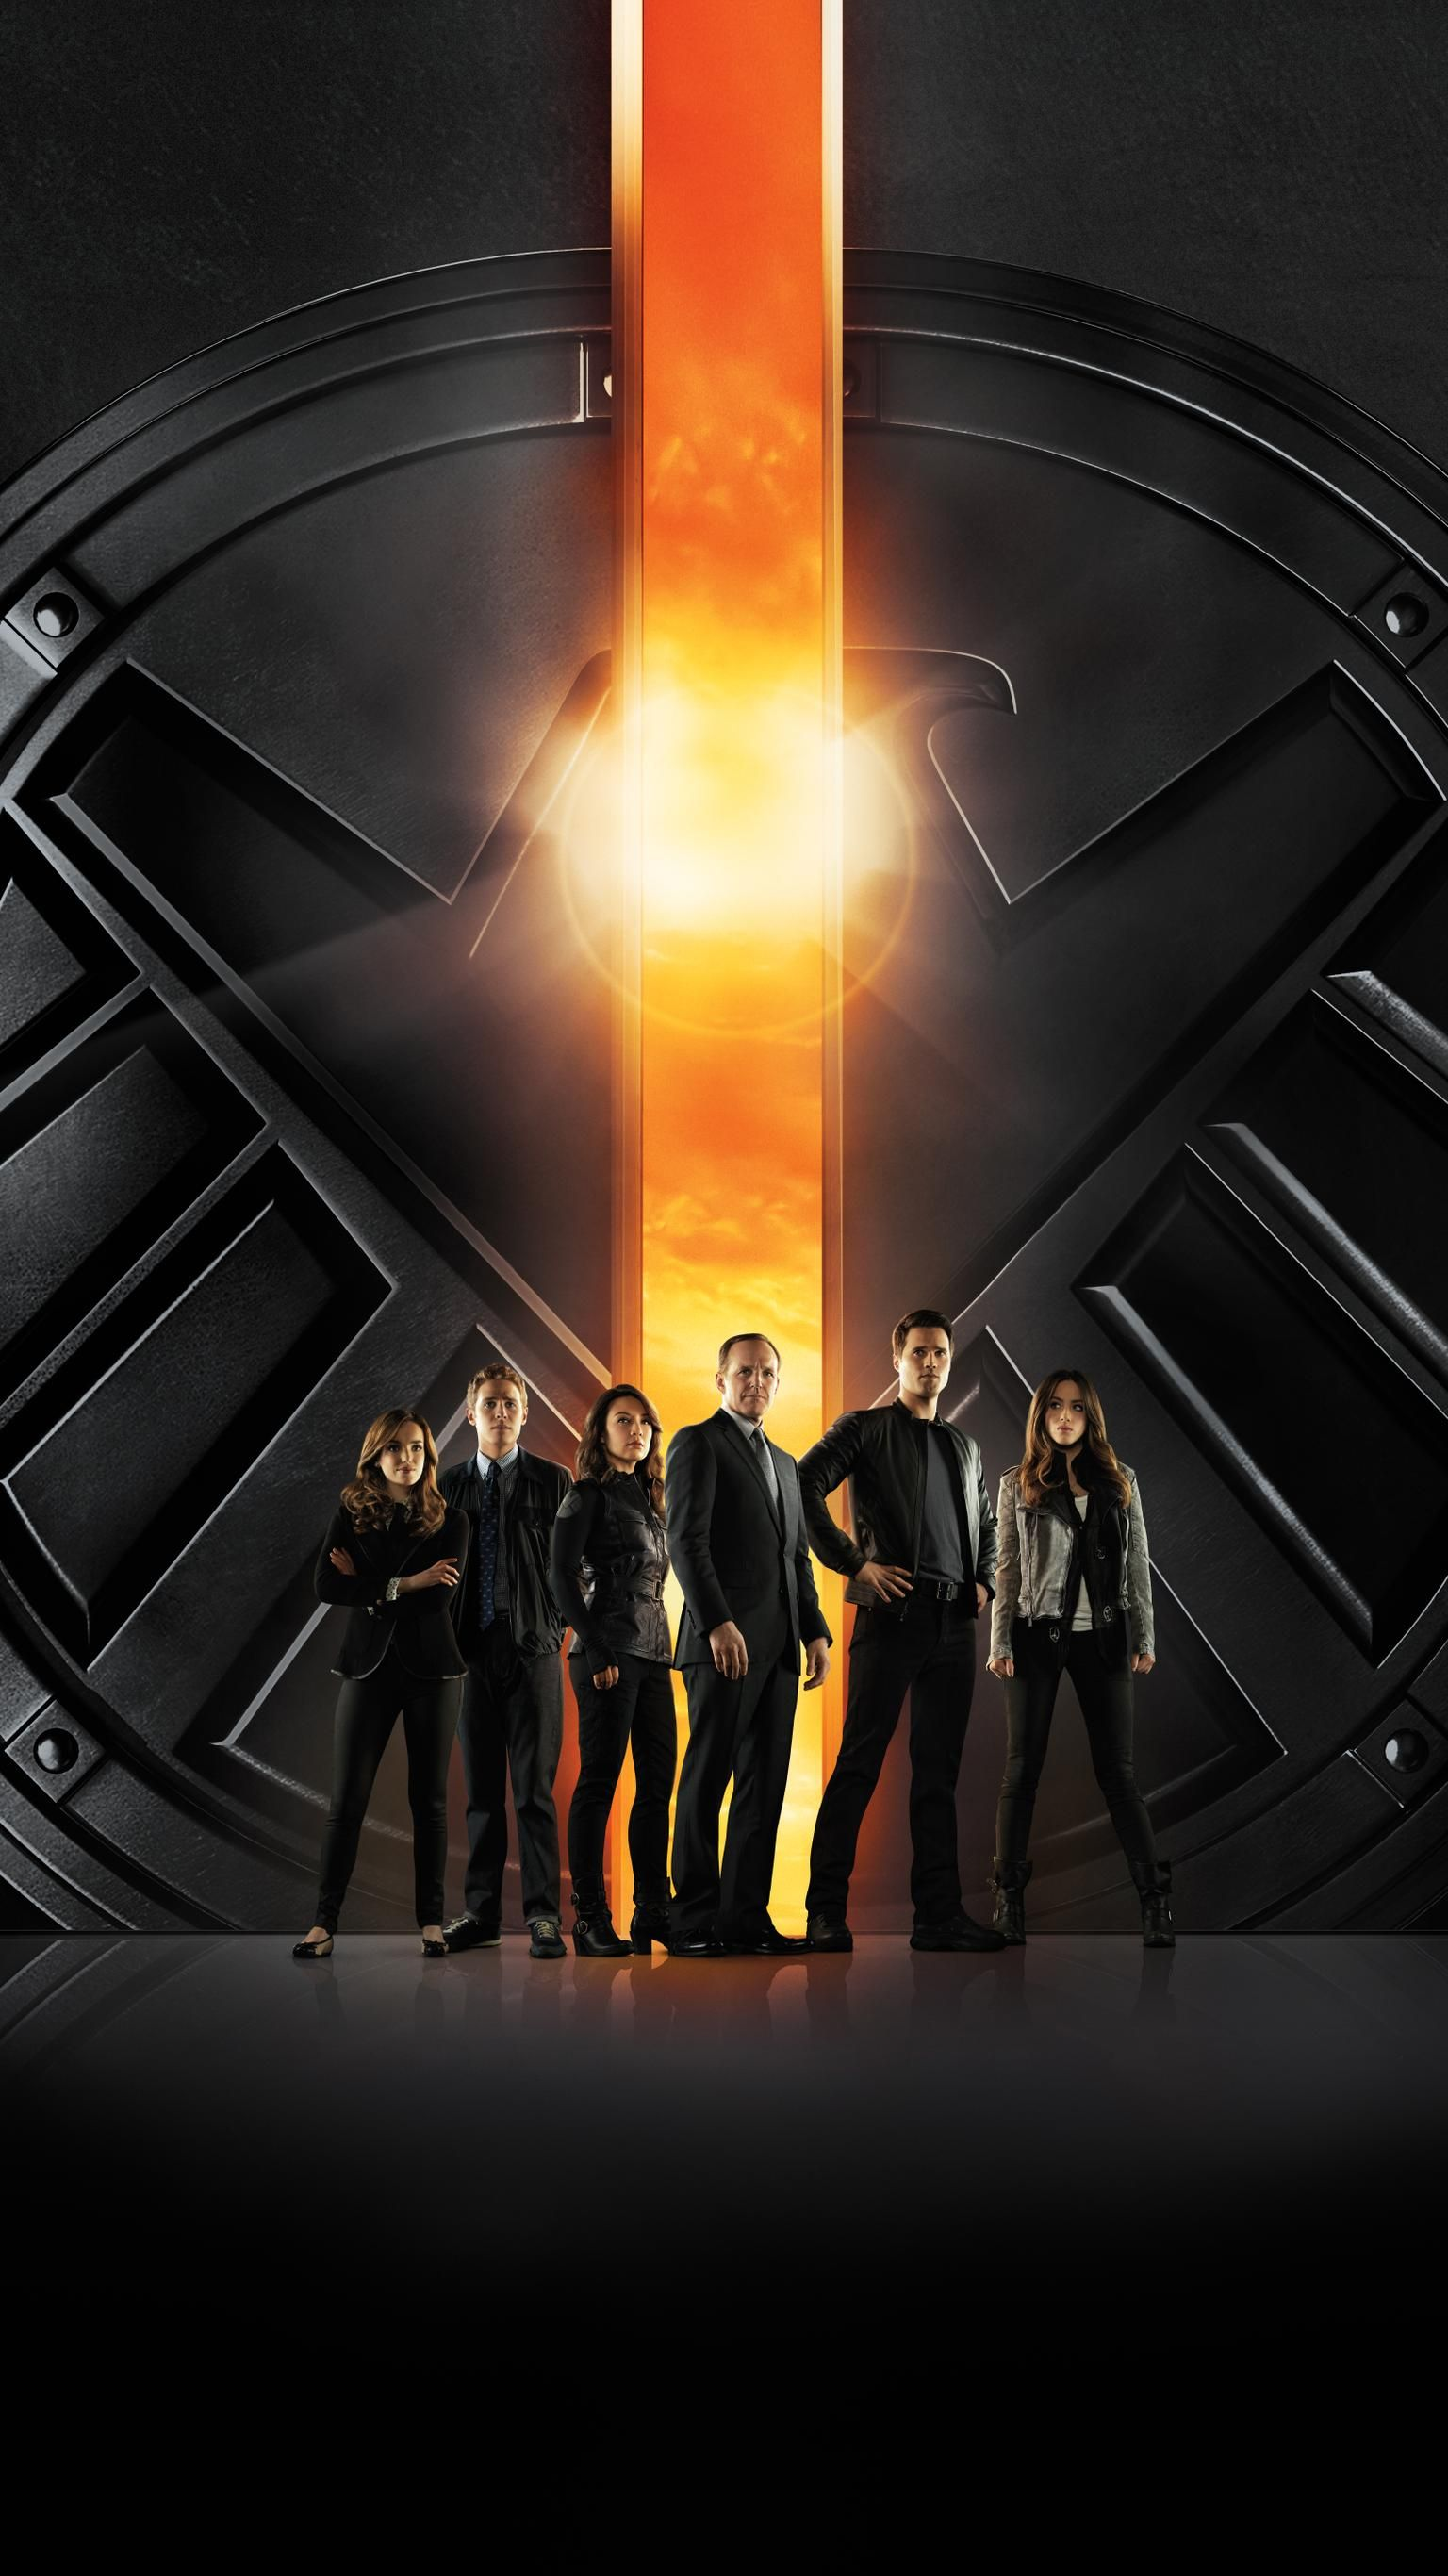 Marvel S Agents Of S H I E L D Phone Wallpaper Moviemania Agents Of Shield Marvels Agents Of Shield Marvel Shield